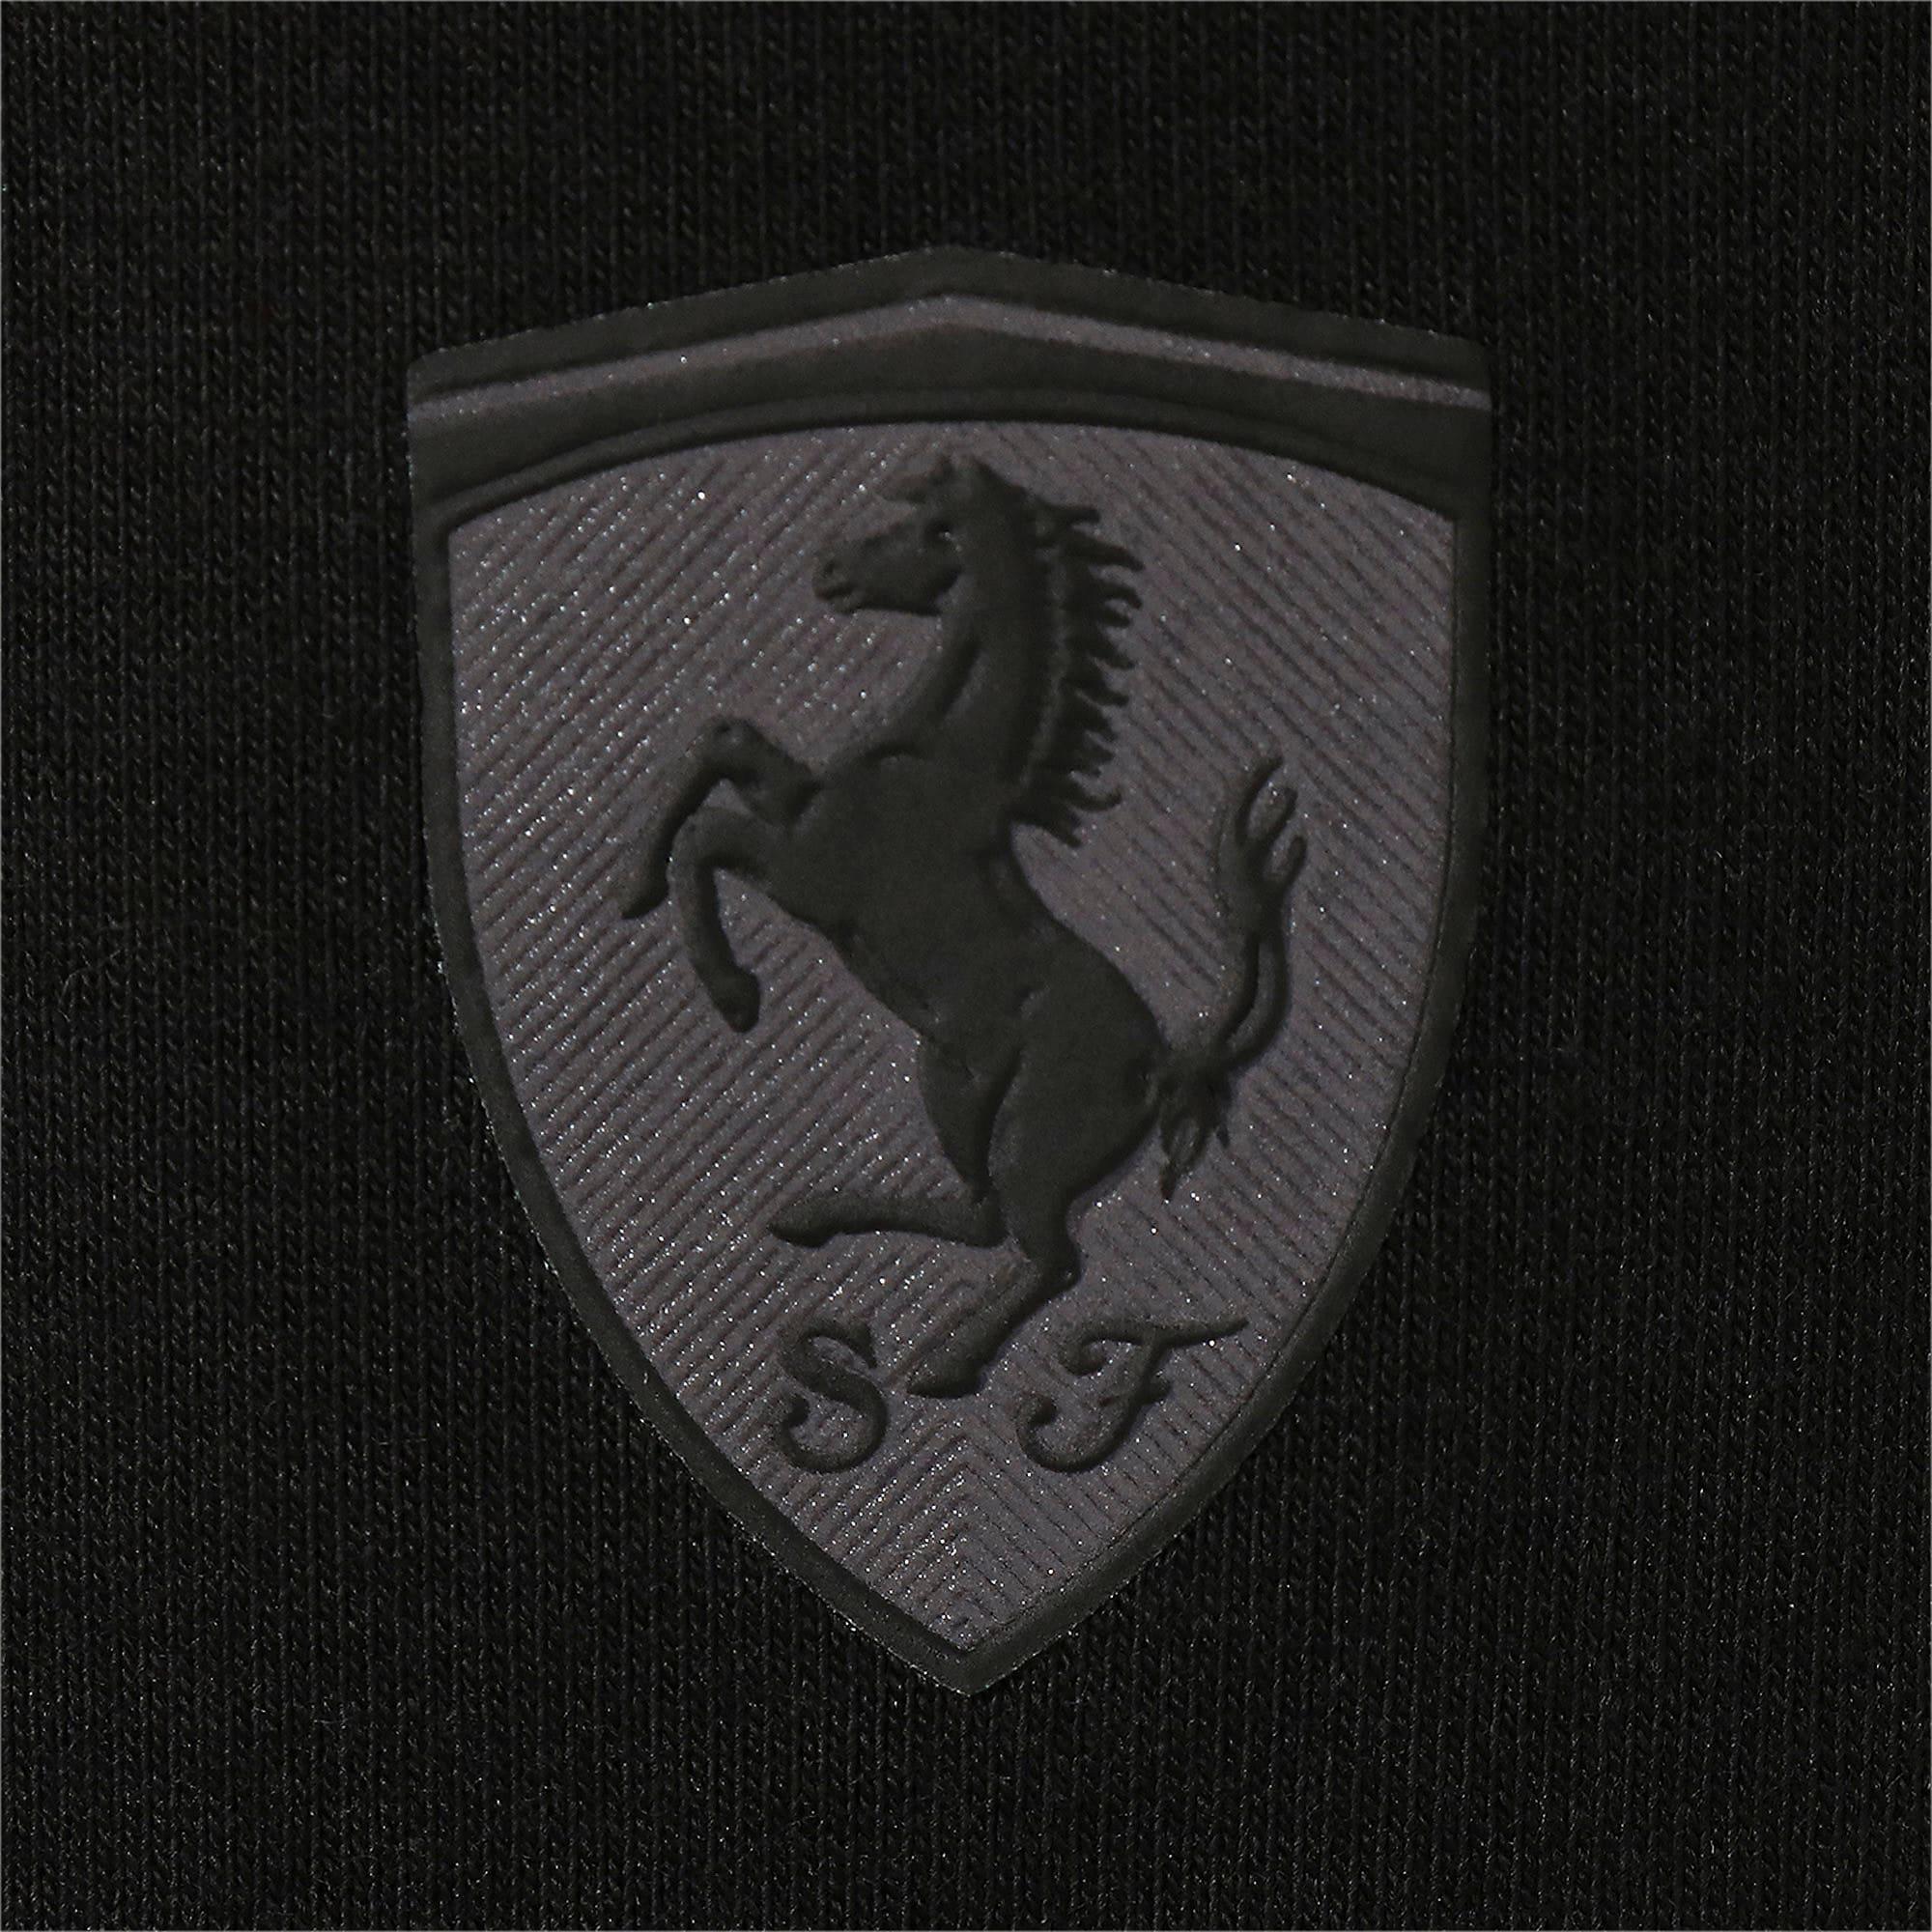 Thumbnail 7 of フェラーリ スウェット パンツ CC, Puma Black, medium-JPN